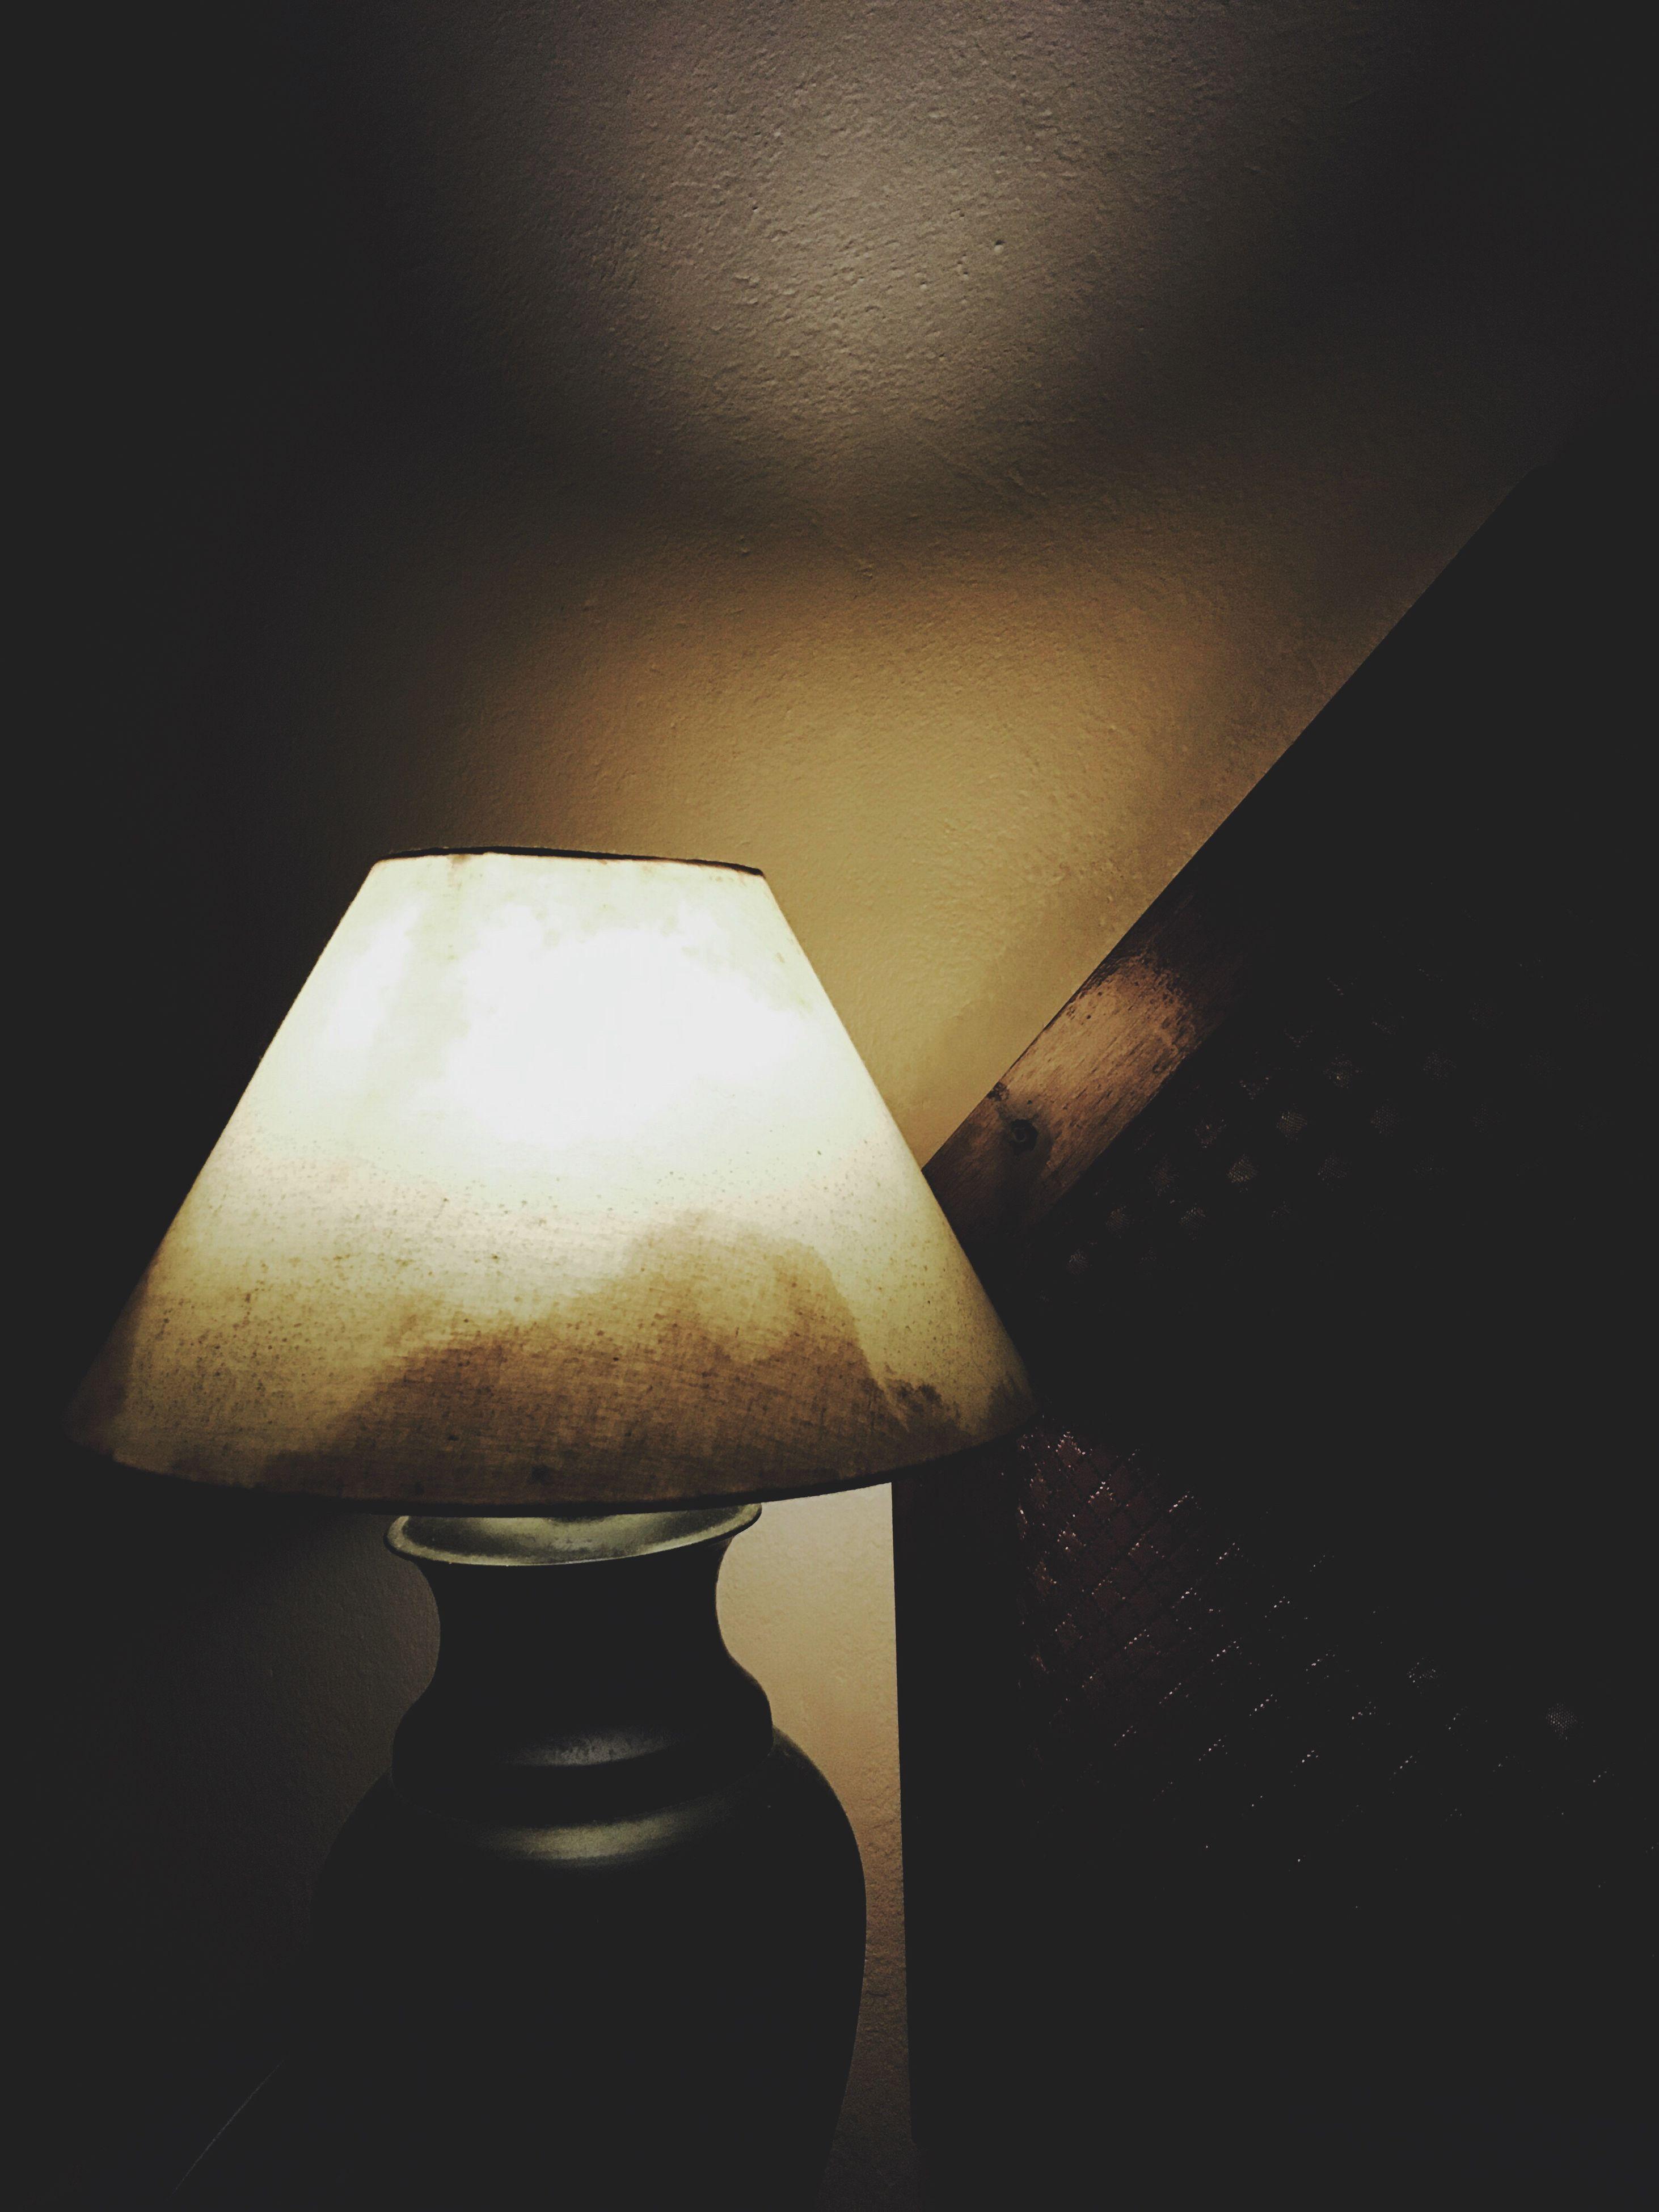 indoors, close-up, still life, single object, wall - building feature, copy space, illuminated, lighting equipment, no people, studio shot, home interior, dark, metal, black background, shadow, darkroom, light - natural phenomenon, shape, night, art and craft